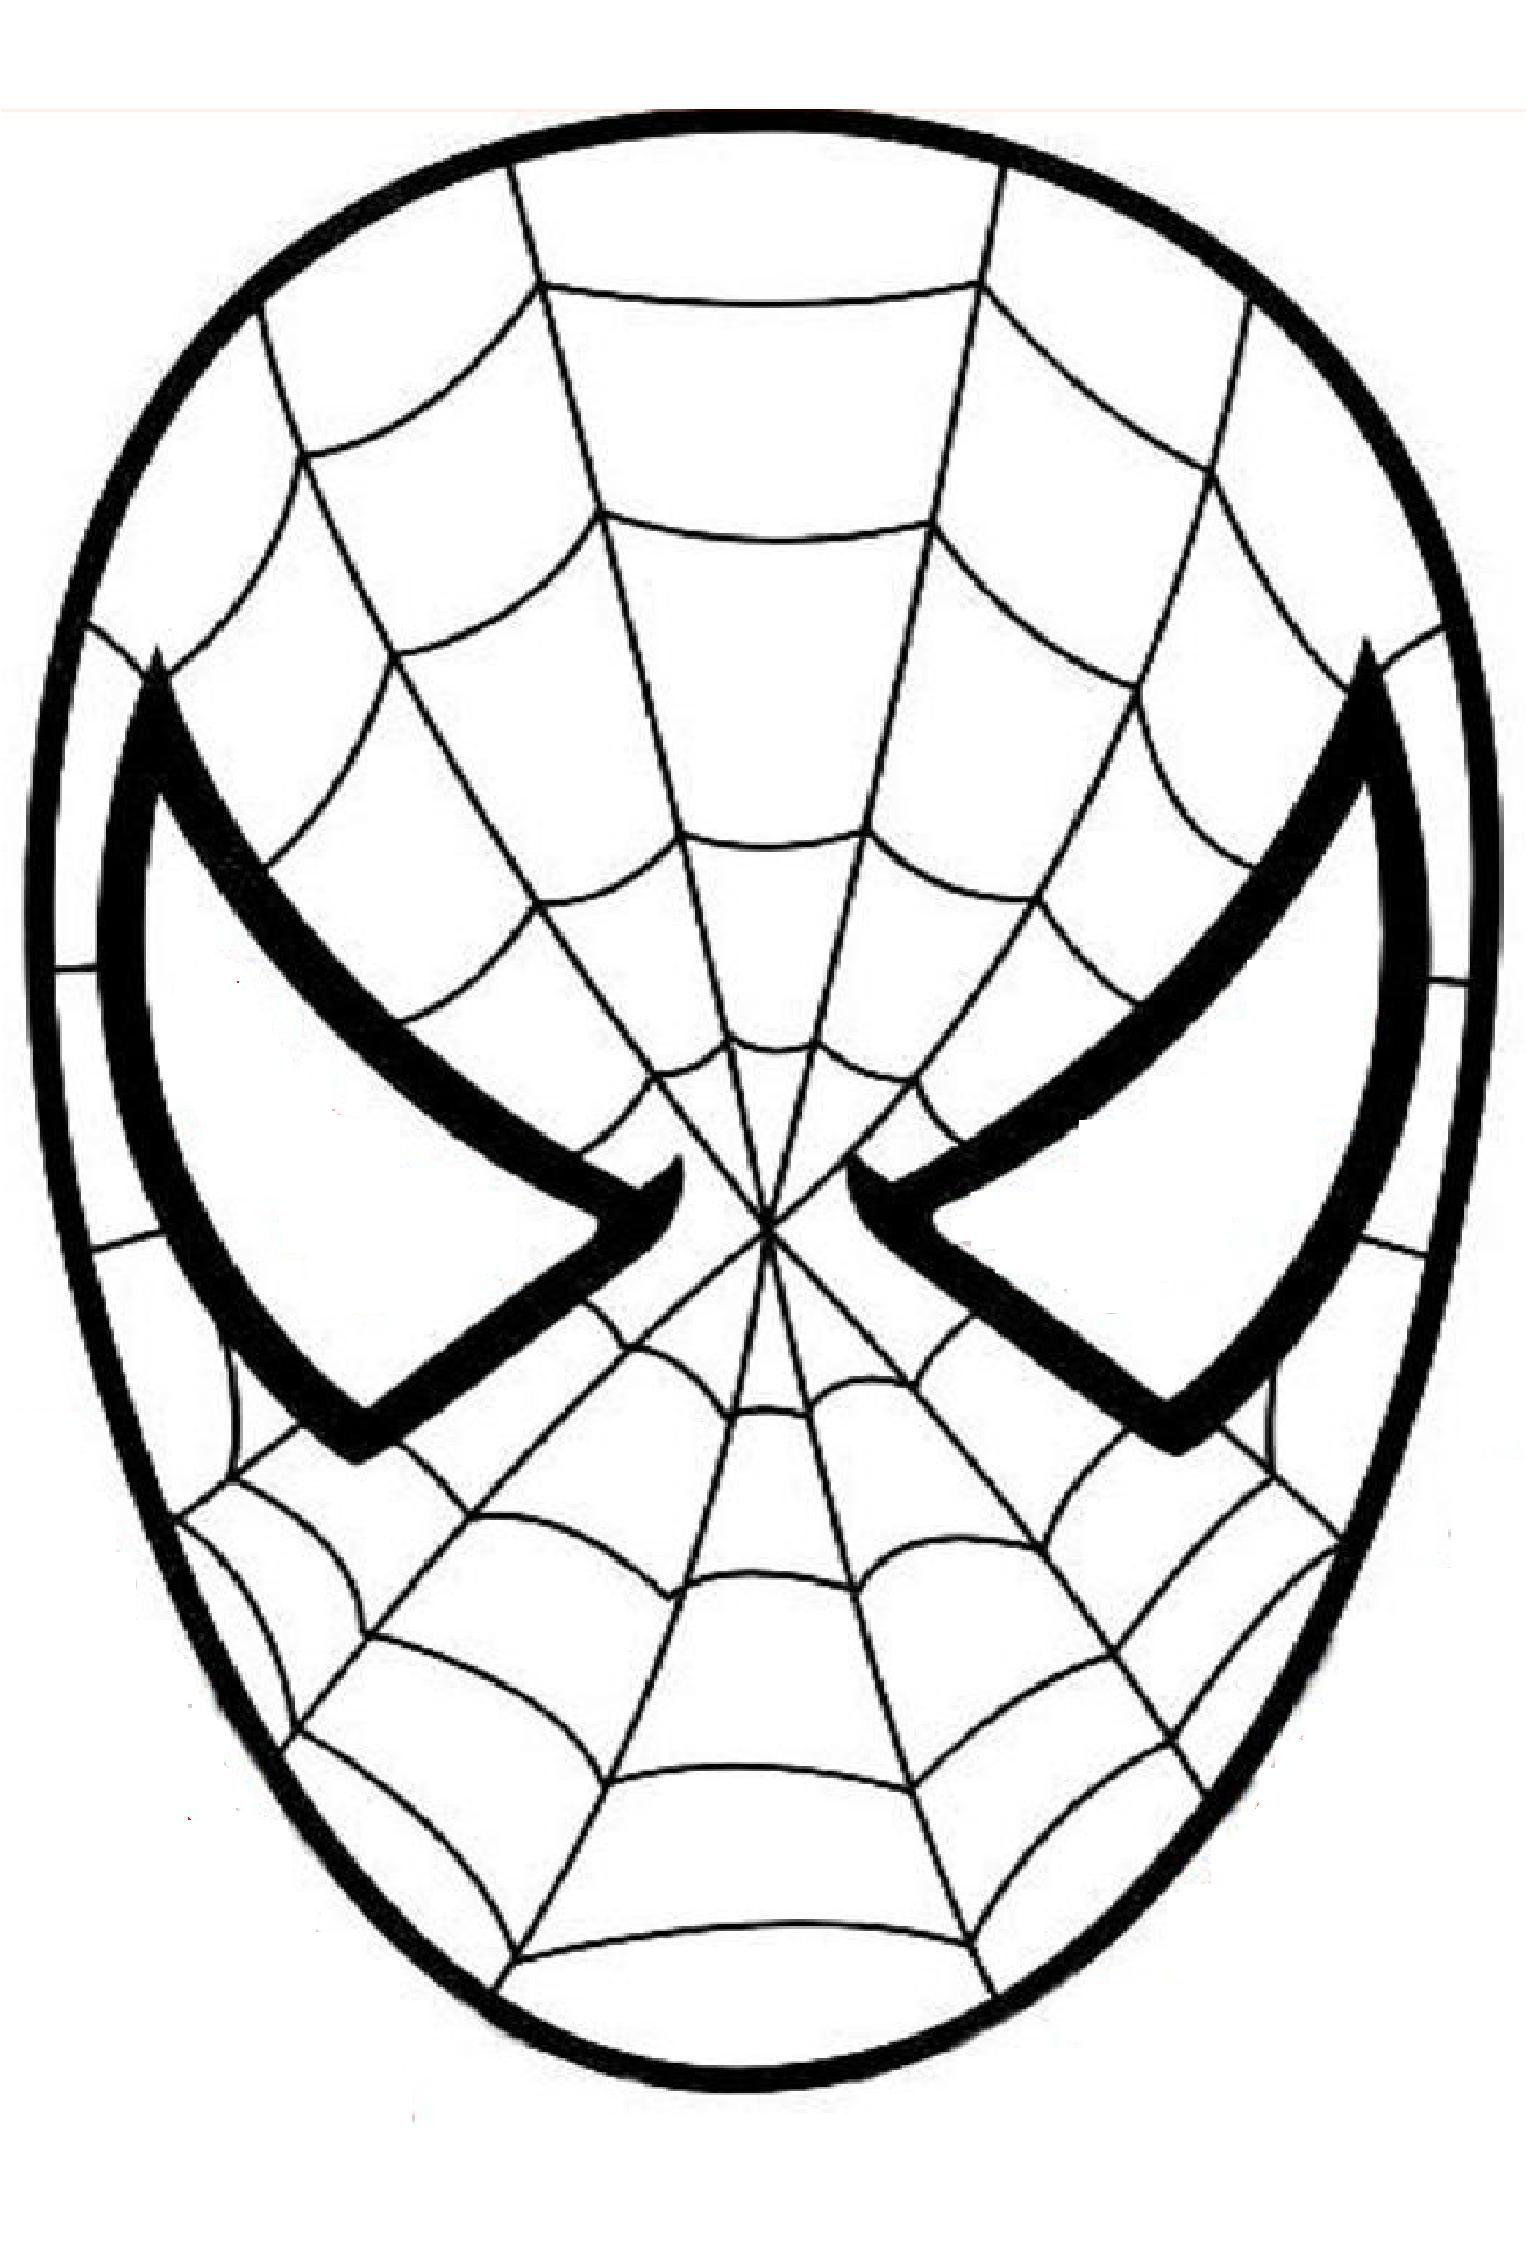 15 Nouveau Coloriage Spider Man Stock Sketch Templates Ideas Of Sketch Templates Sketchtemplates Es Spiderman Coloring Spiderman Mask Spiderman Drawing